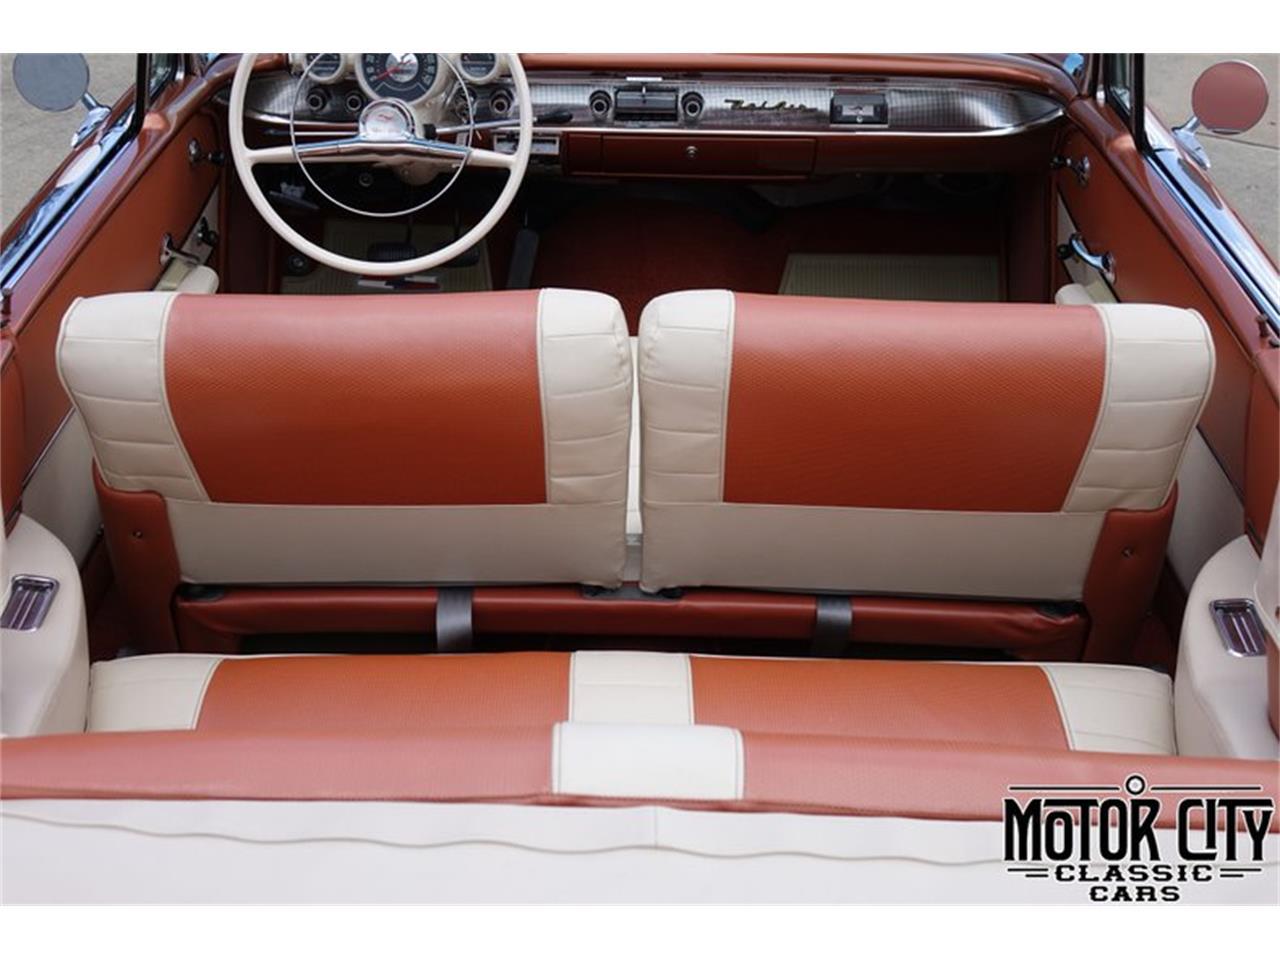 1957 Chevrolet Bel Air (CC-1377278) for sale in Vero Beach, Florida